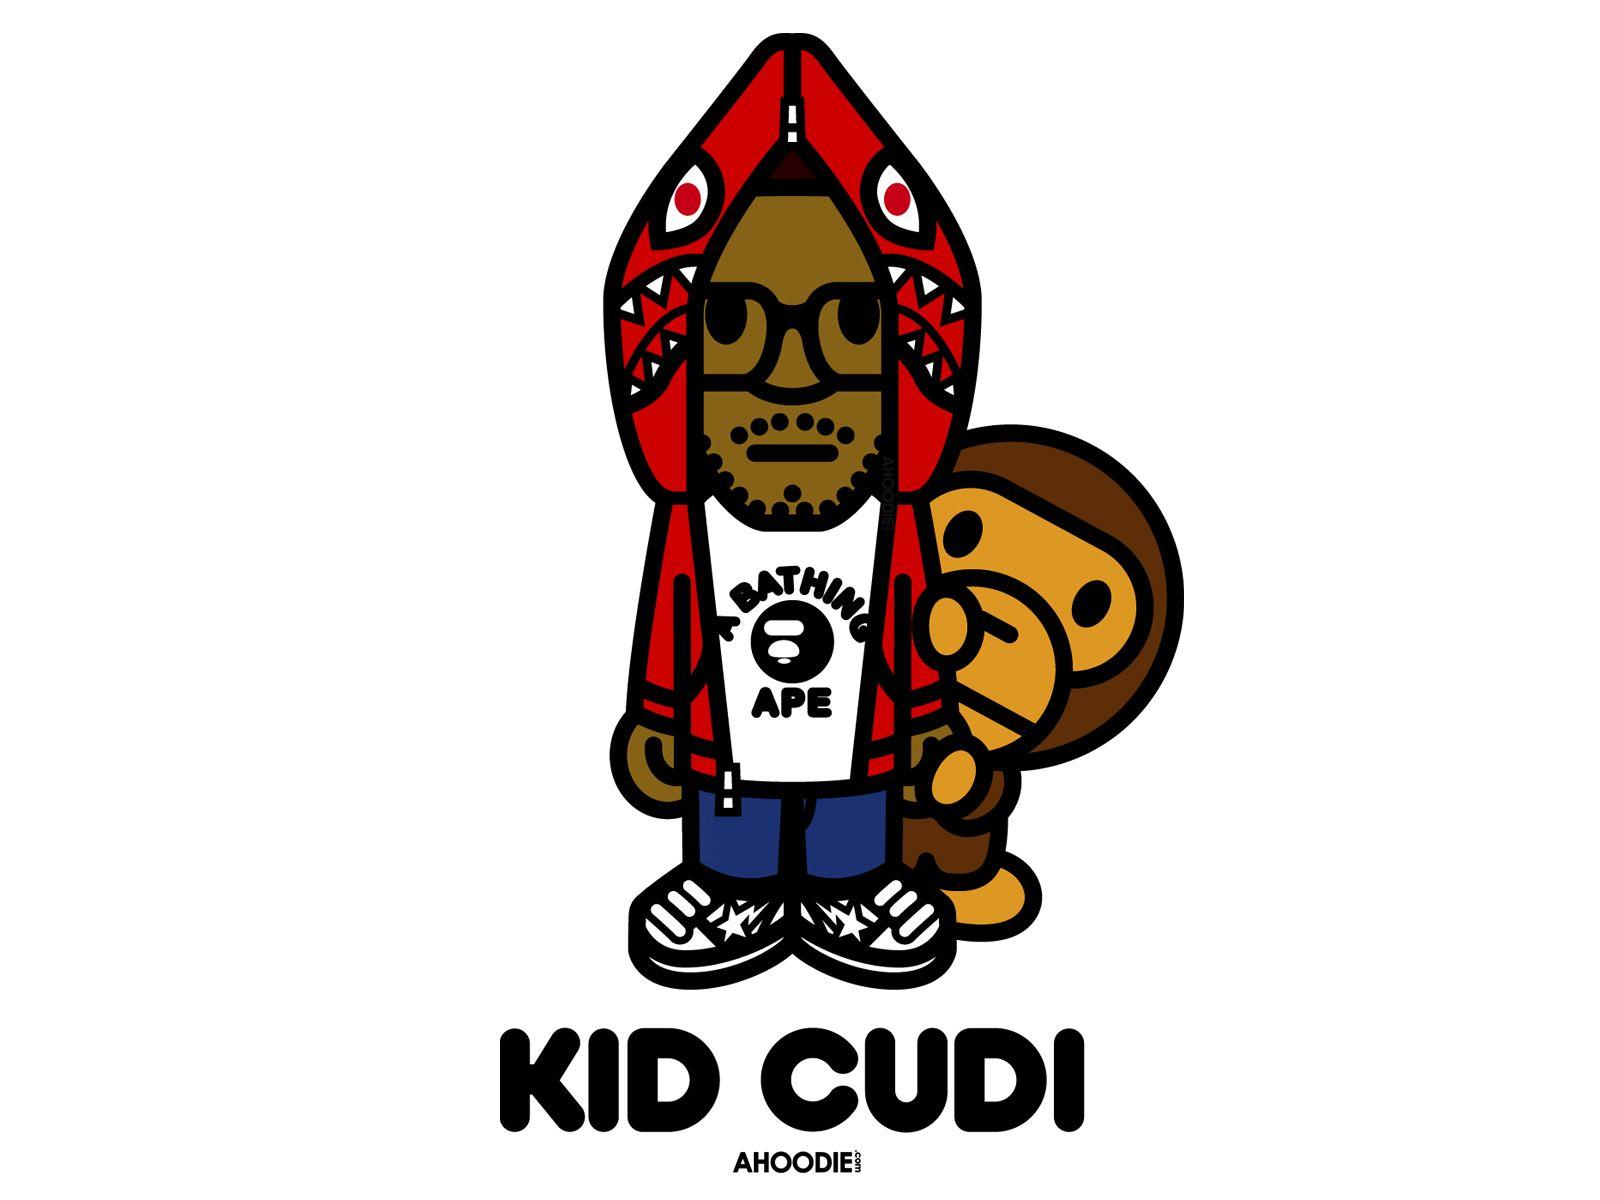 7577197cc Kid Cudi is my favorite artist and